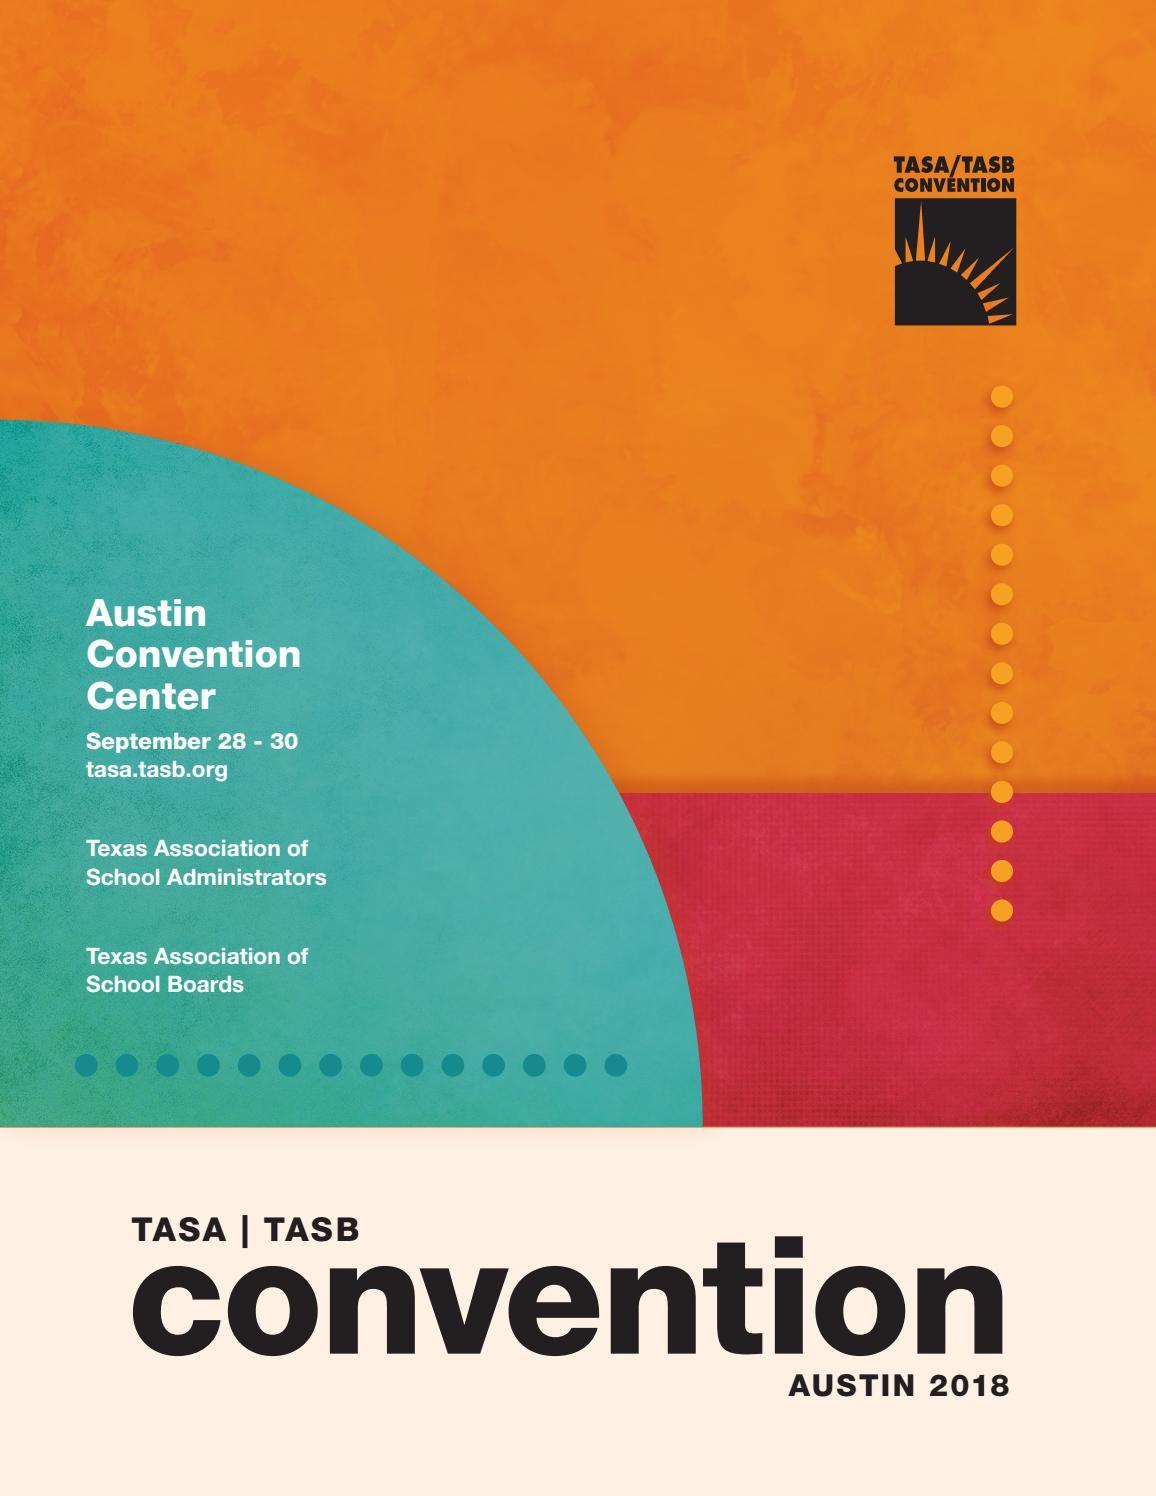 TASA/TASB Convention Program by Texas Association of School ...